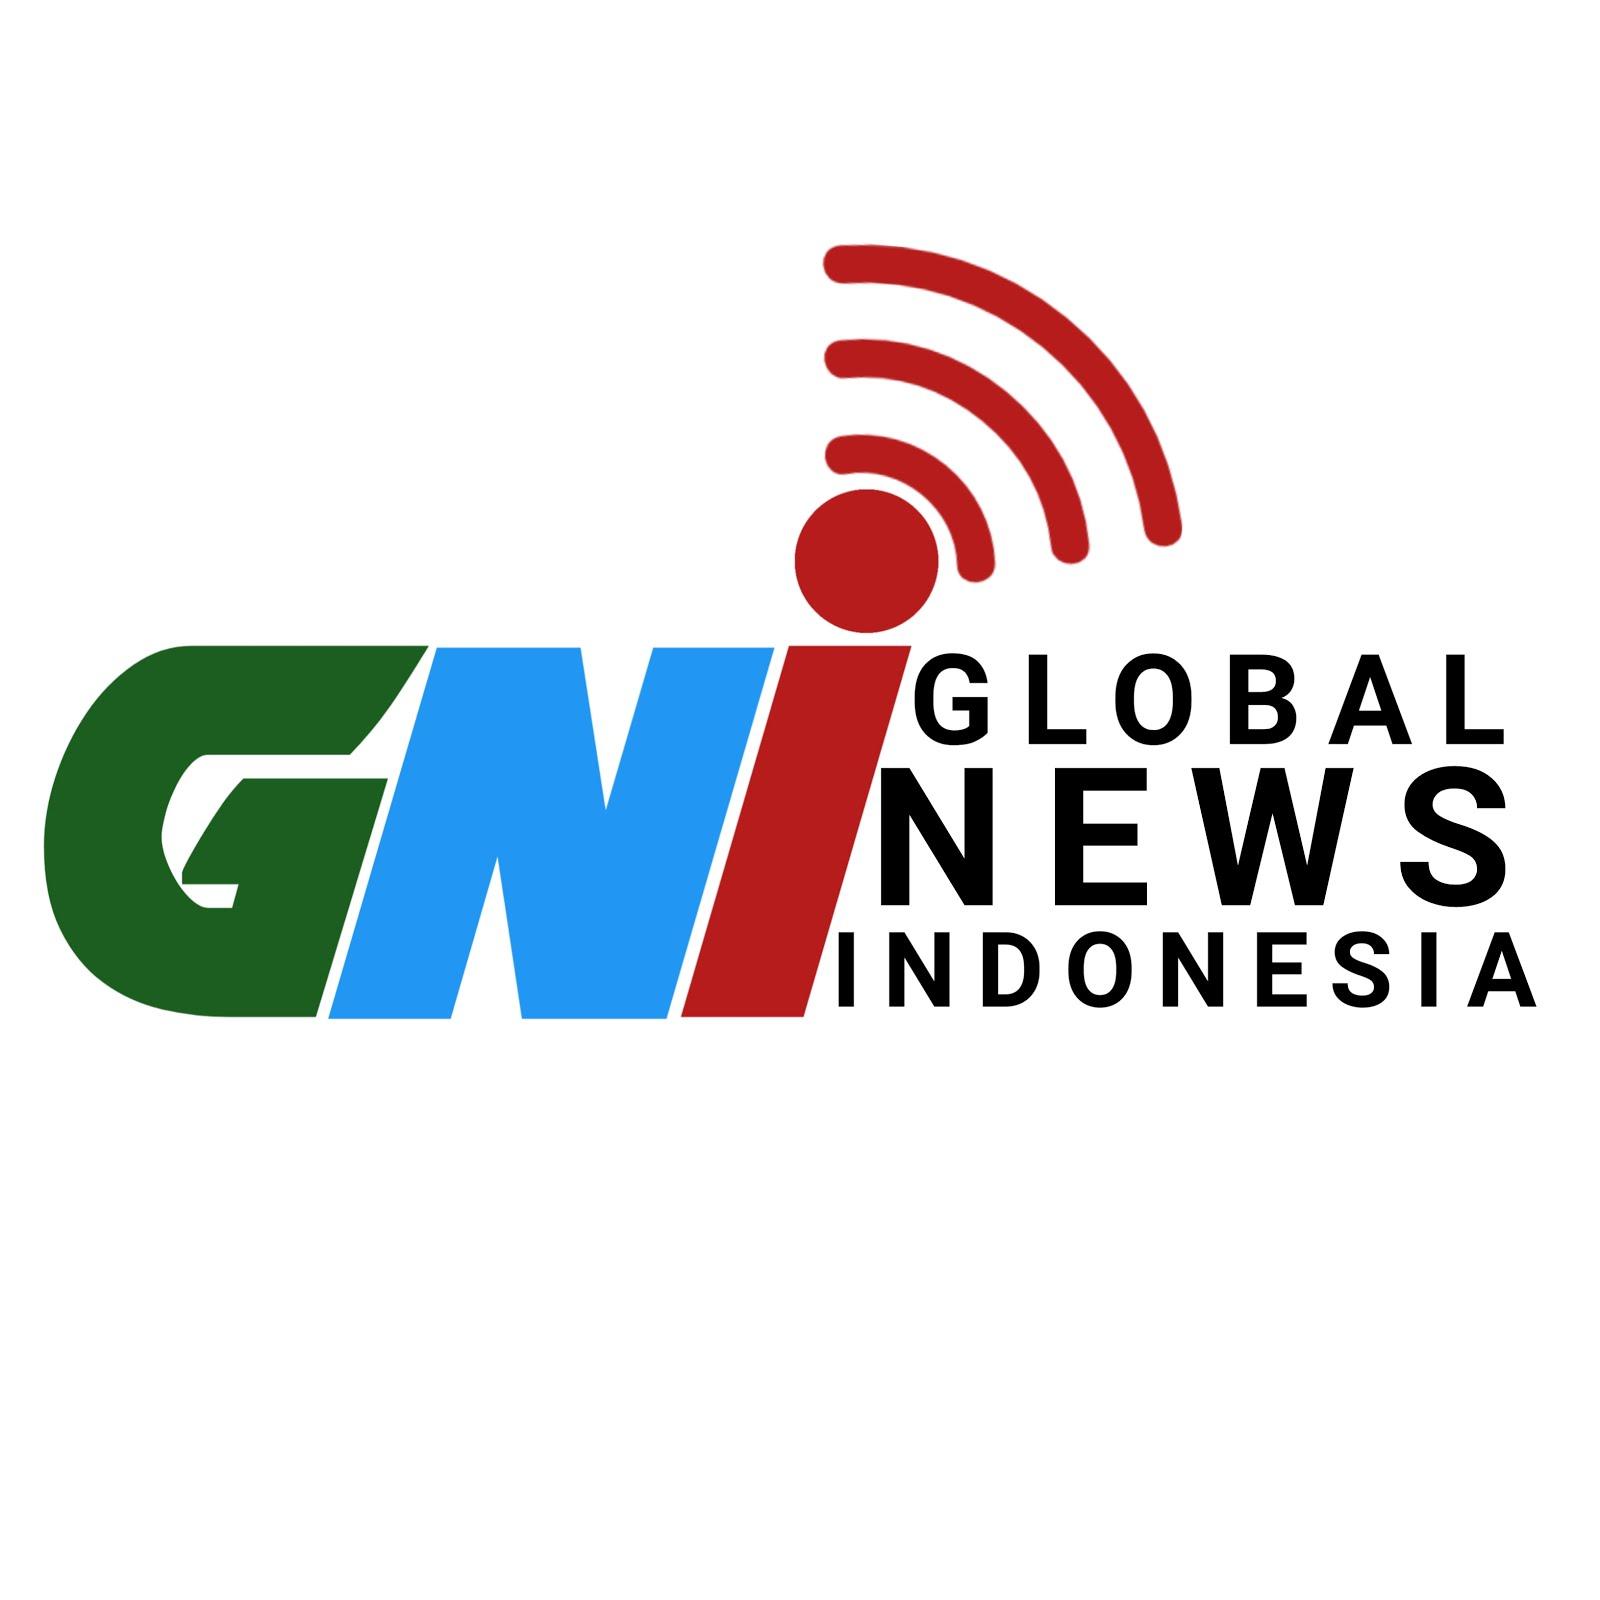 Global News Indonesia